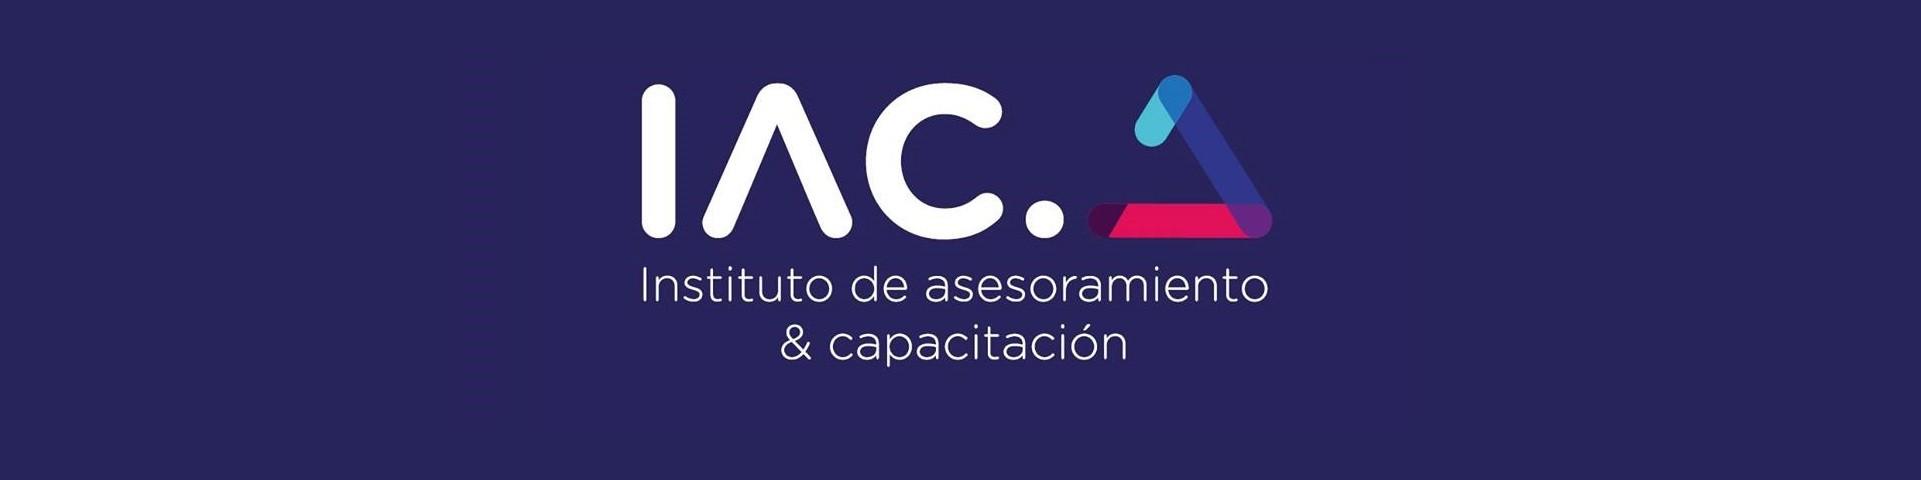 Blog IAC